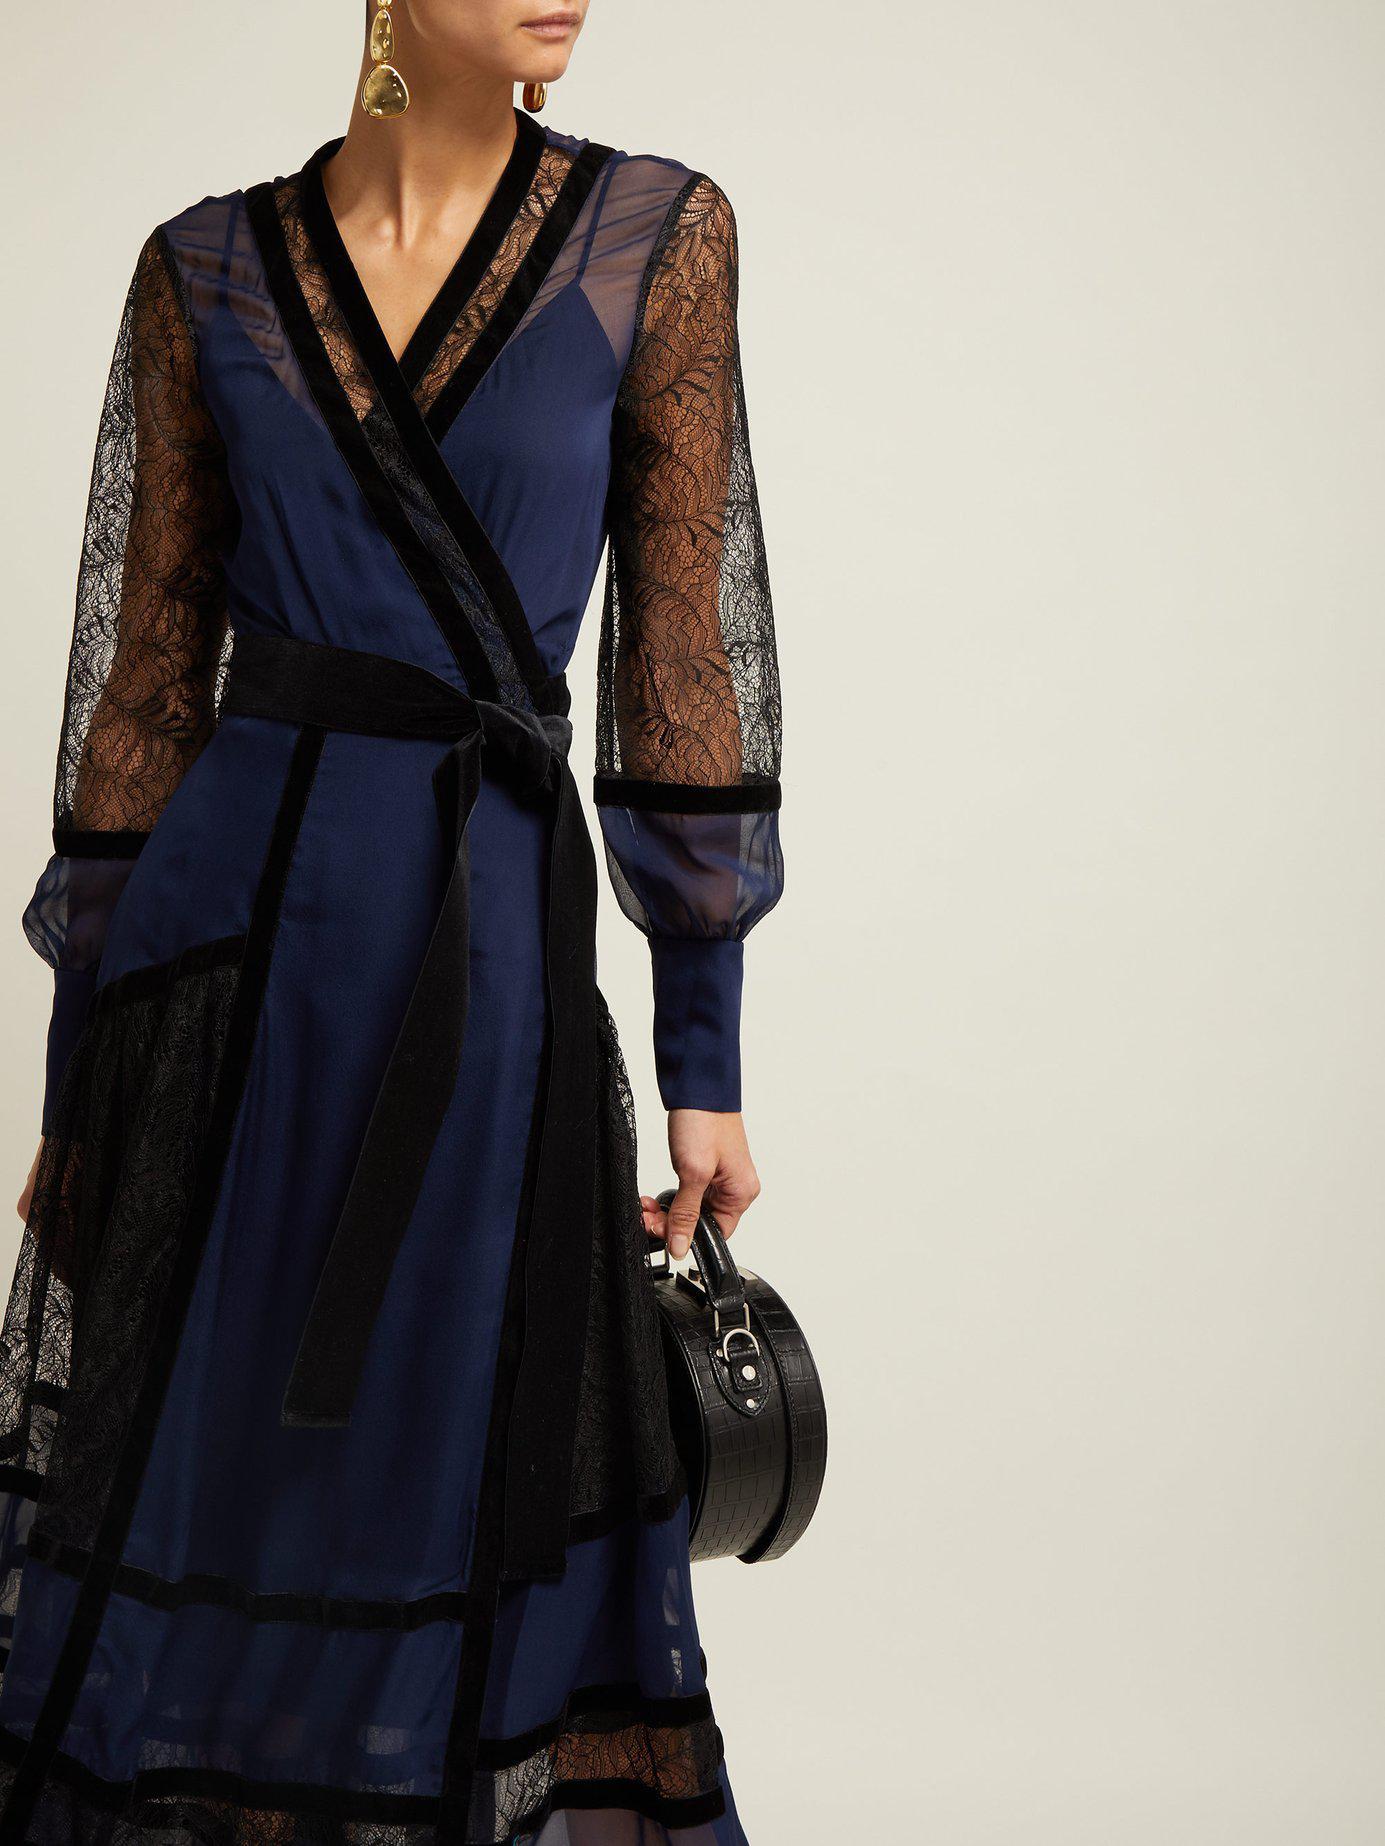 b307e704279a0 Lyst - Diane von Furstenberg Forrest Lace Panel Wrap Dress in Blue - Save 2%